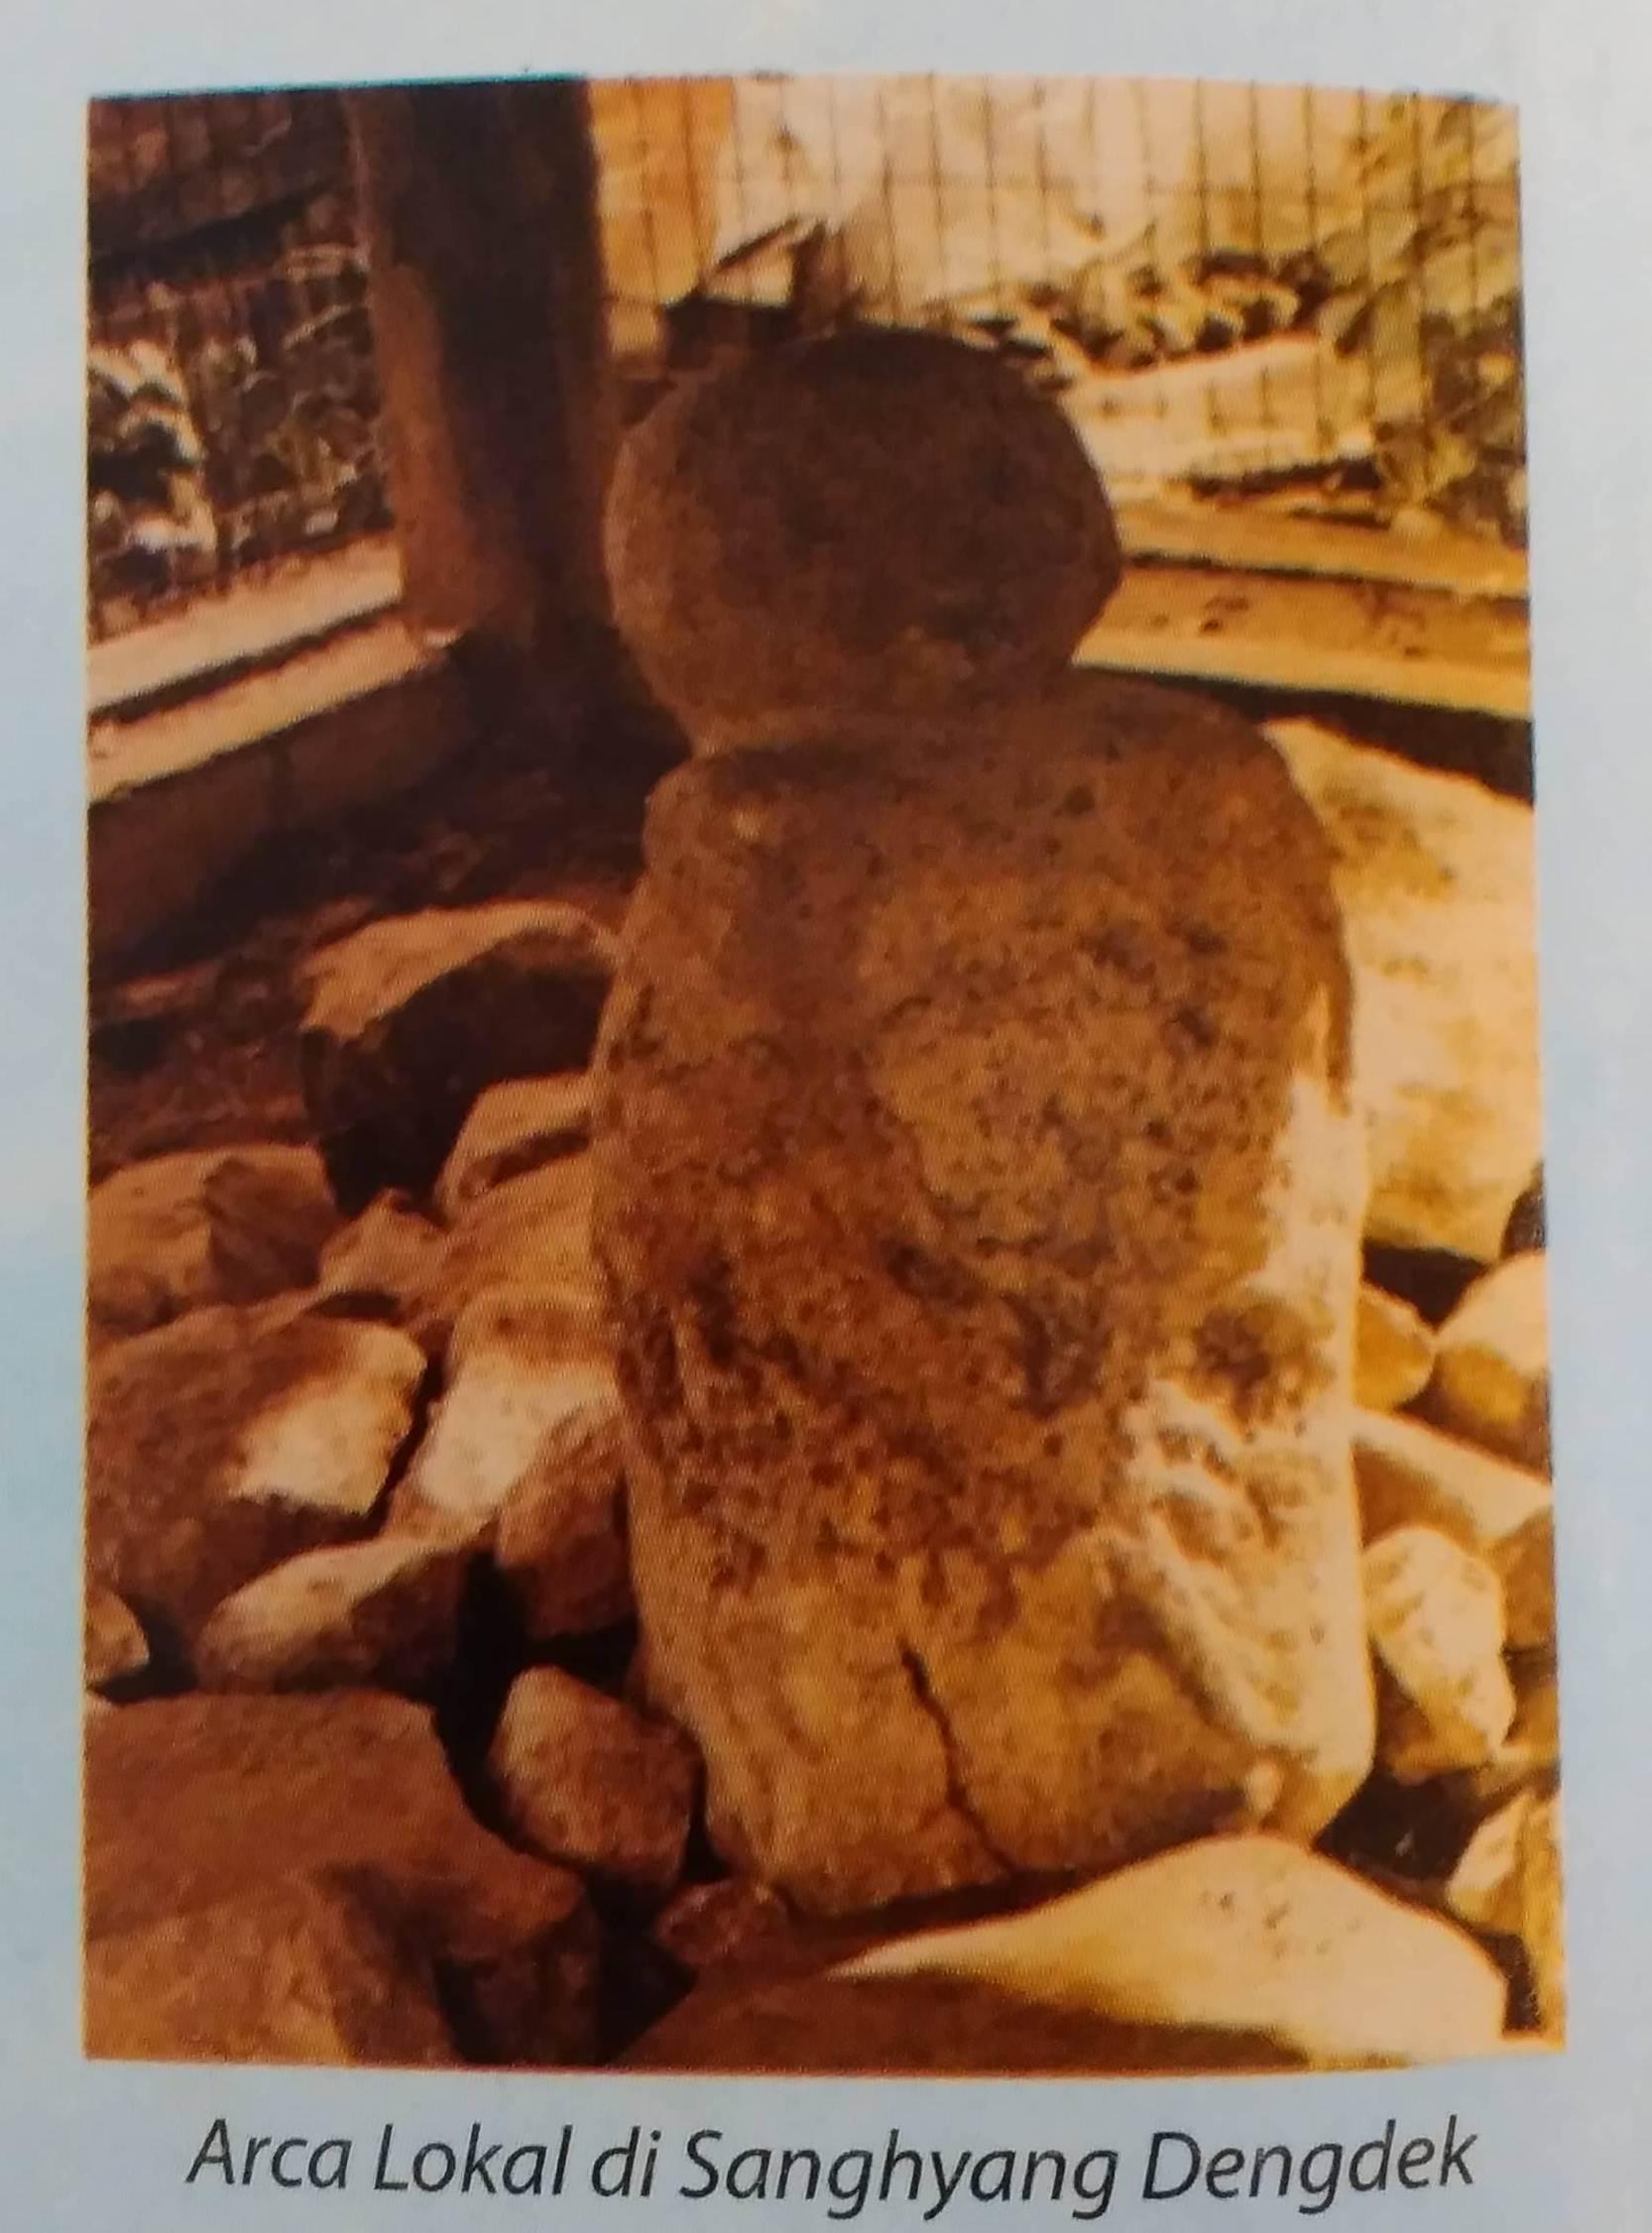 arca purba peninggalan megalitikum